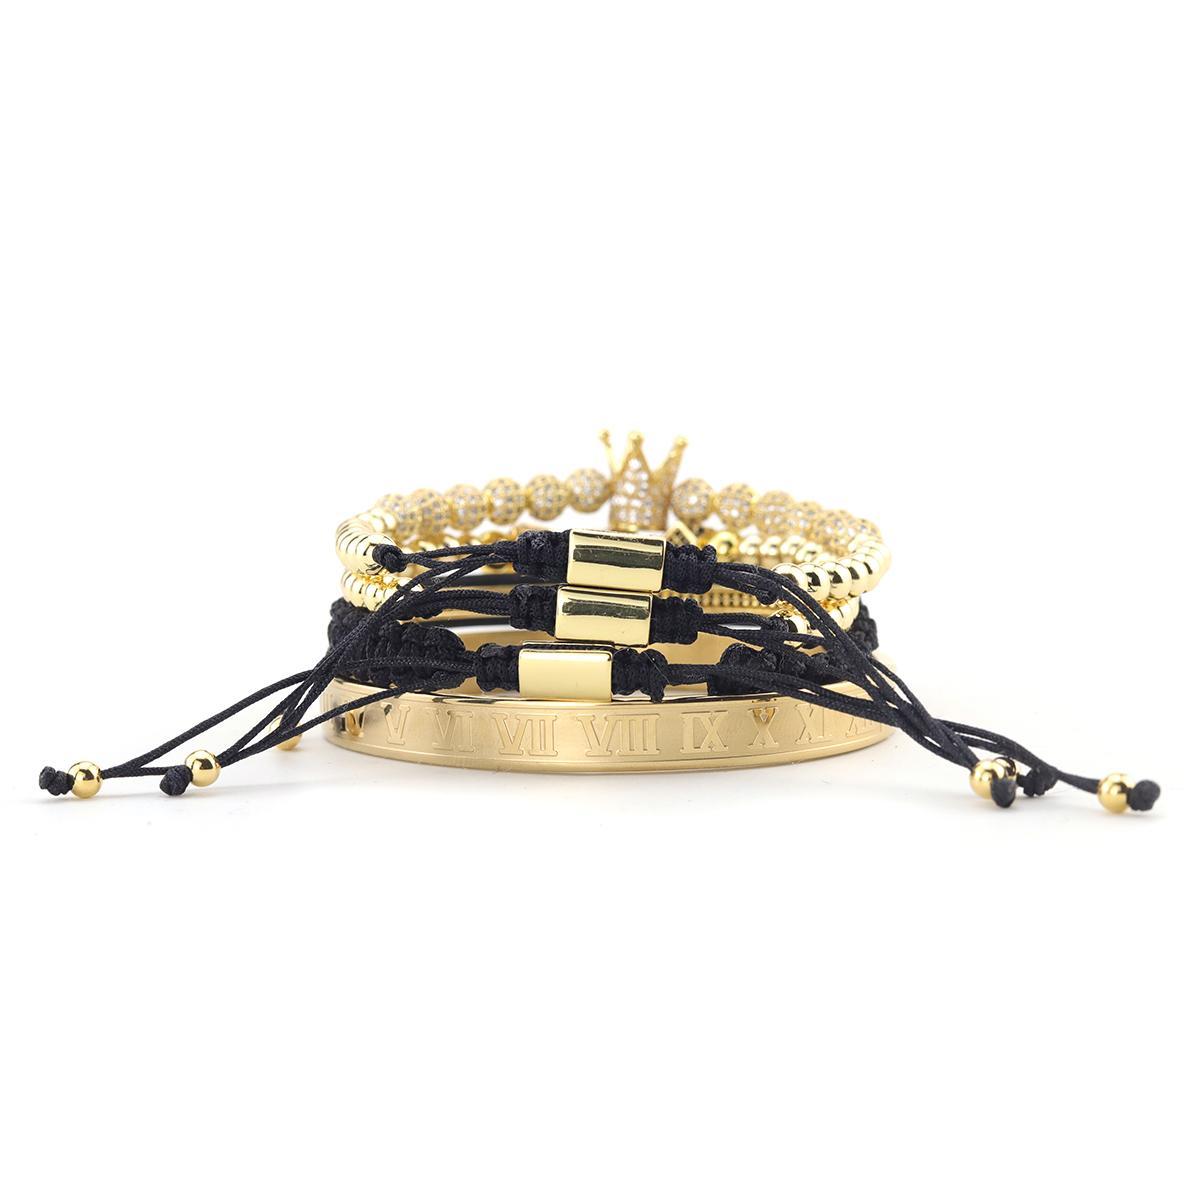 4pcs / Set Luxus Kupfer Perlen König Crown Herren-Armband Edelstahl-Armband CZ KugelMacrame Armbandarmbänder für Männer Schmuck